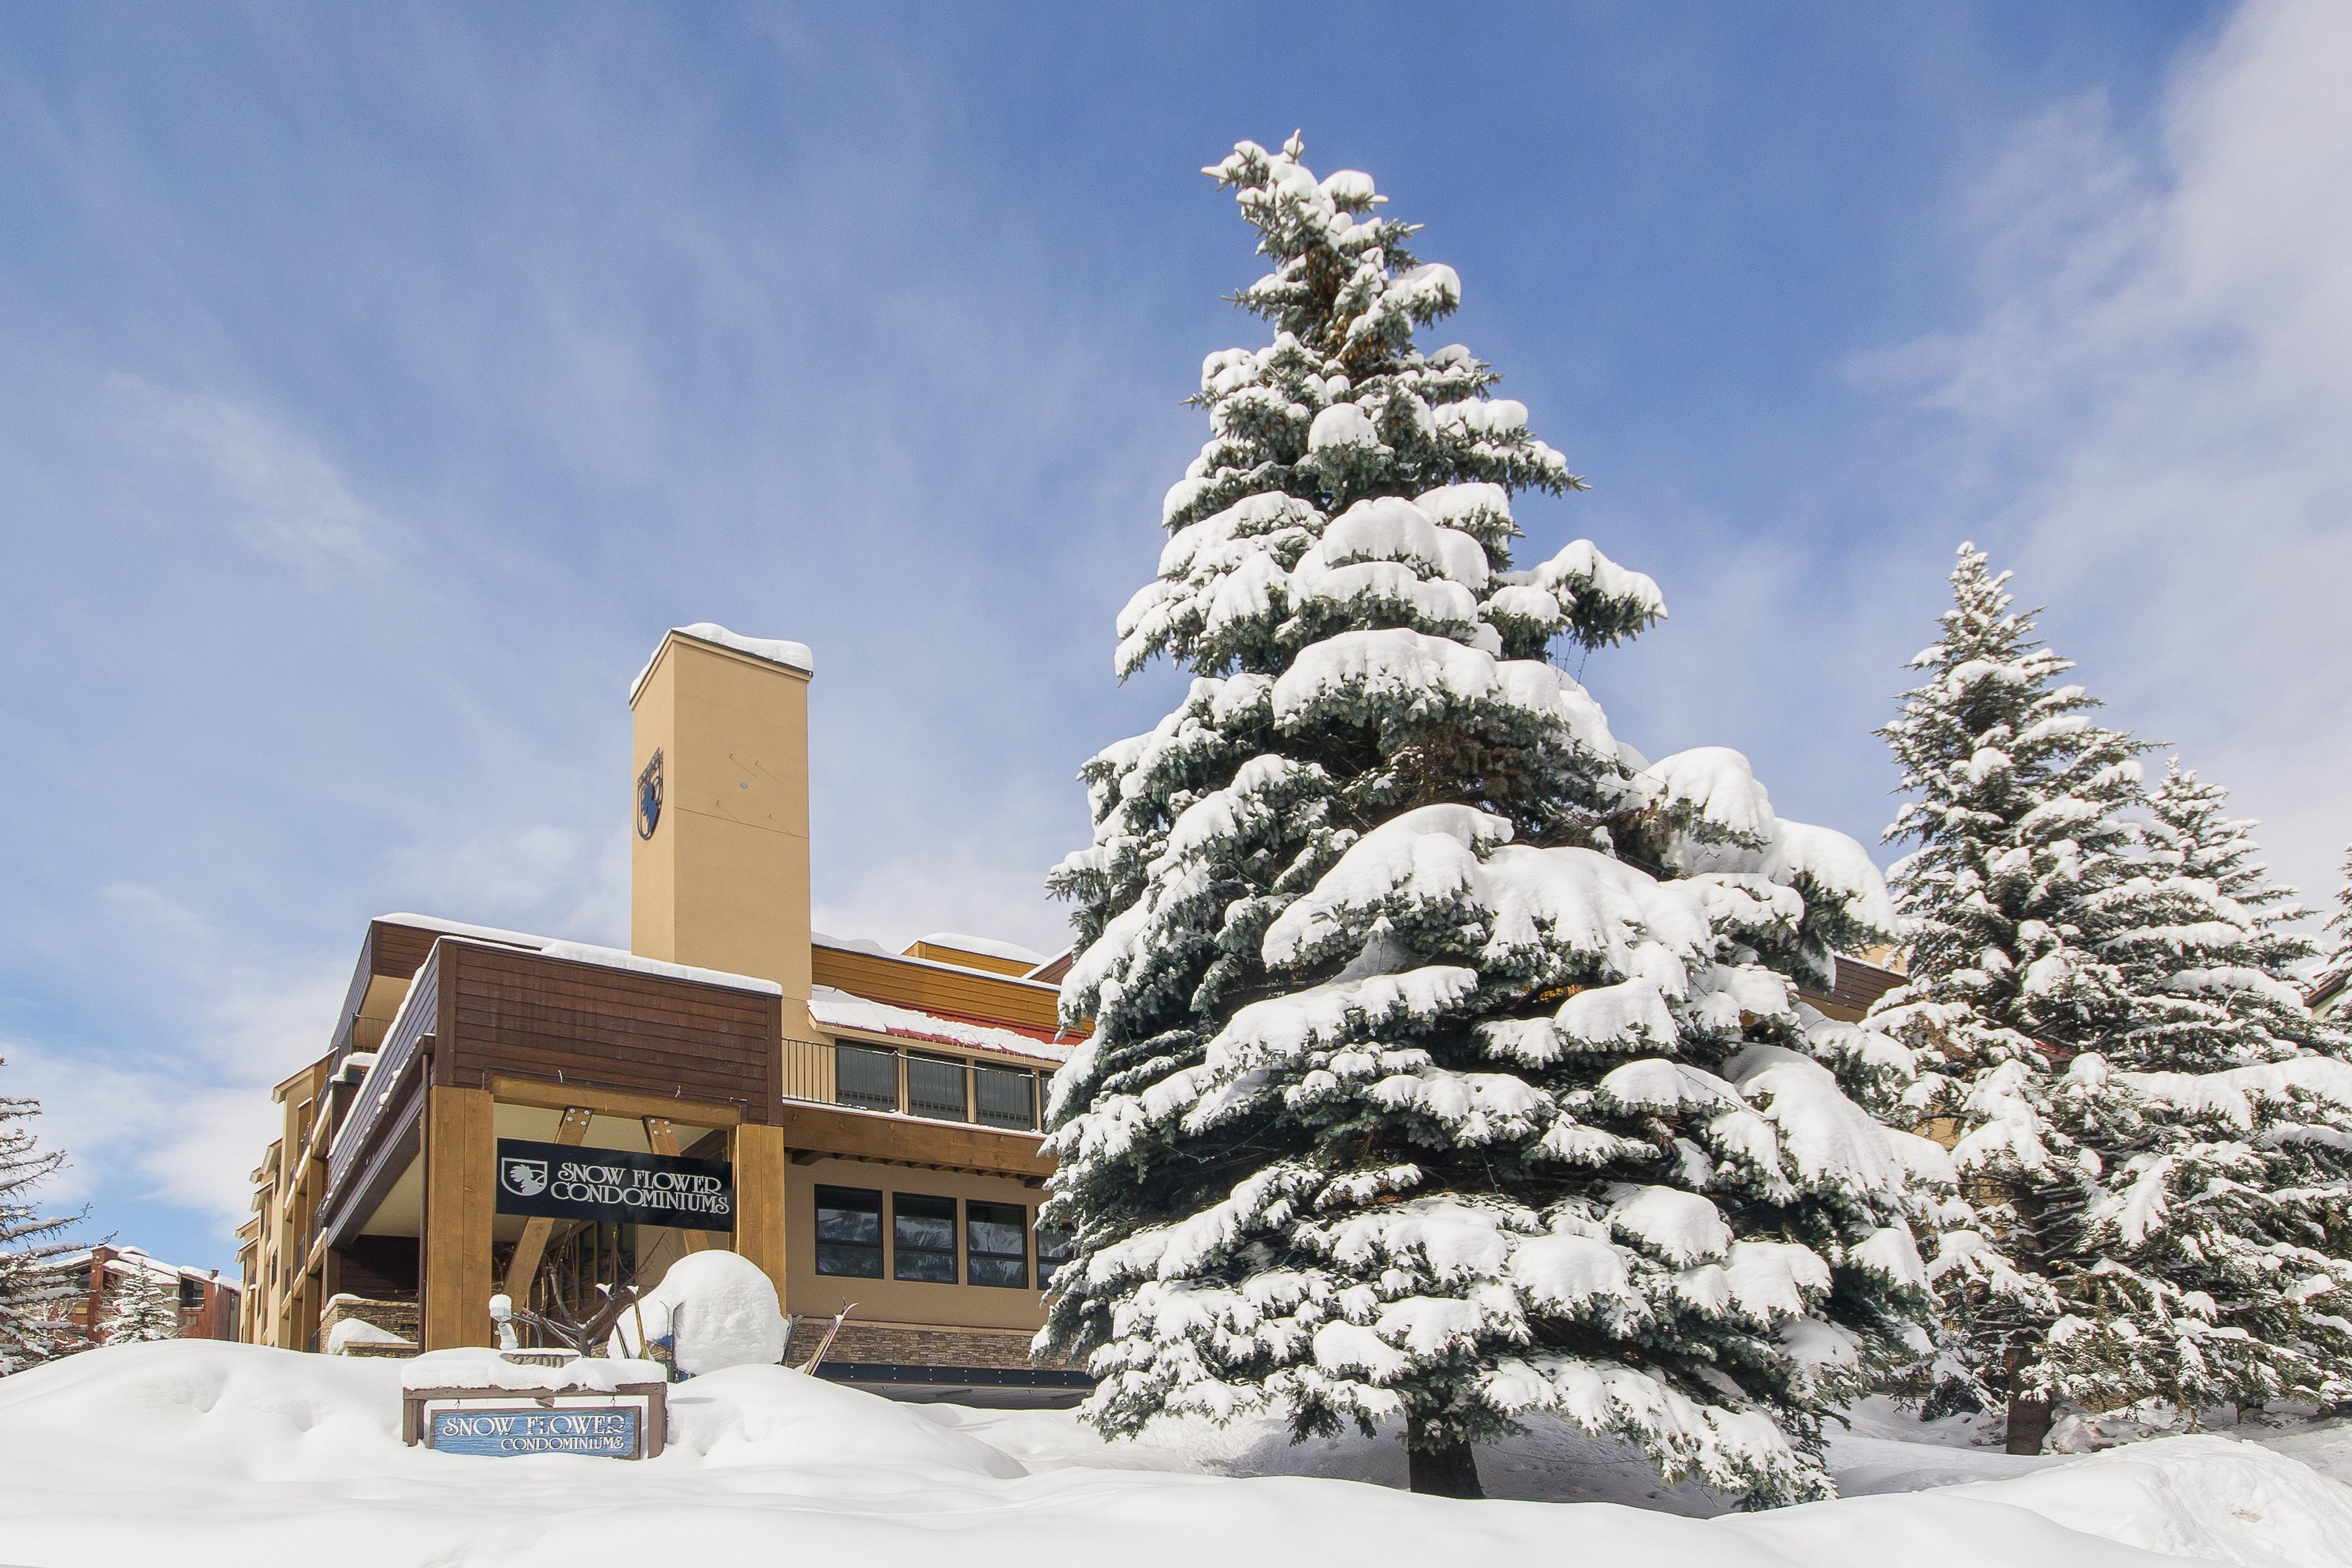 Condominium for Sale at Base Area Ski Condo @ Snowflower 2200 Apres Ski Way #311 Steamboat Springs, Colorado 80487 United States